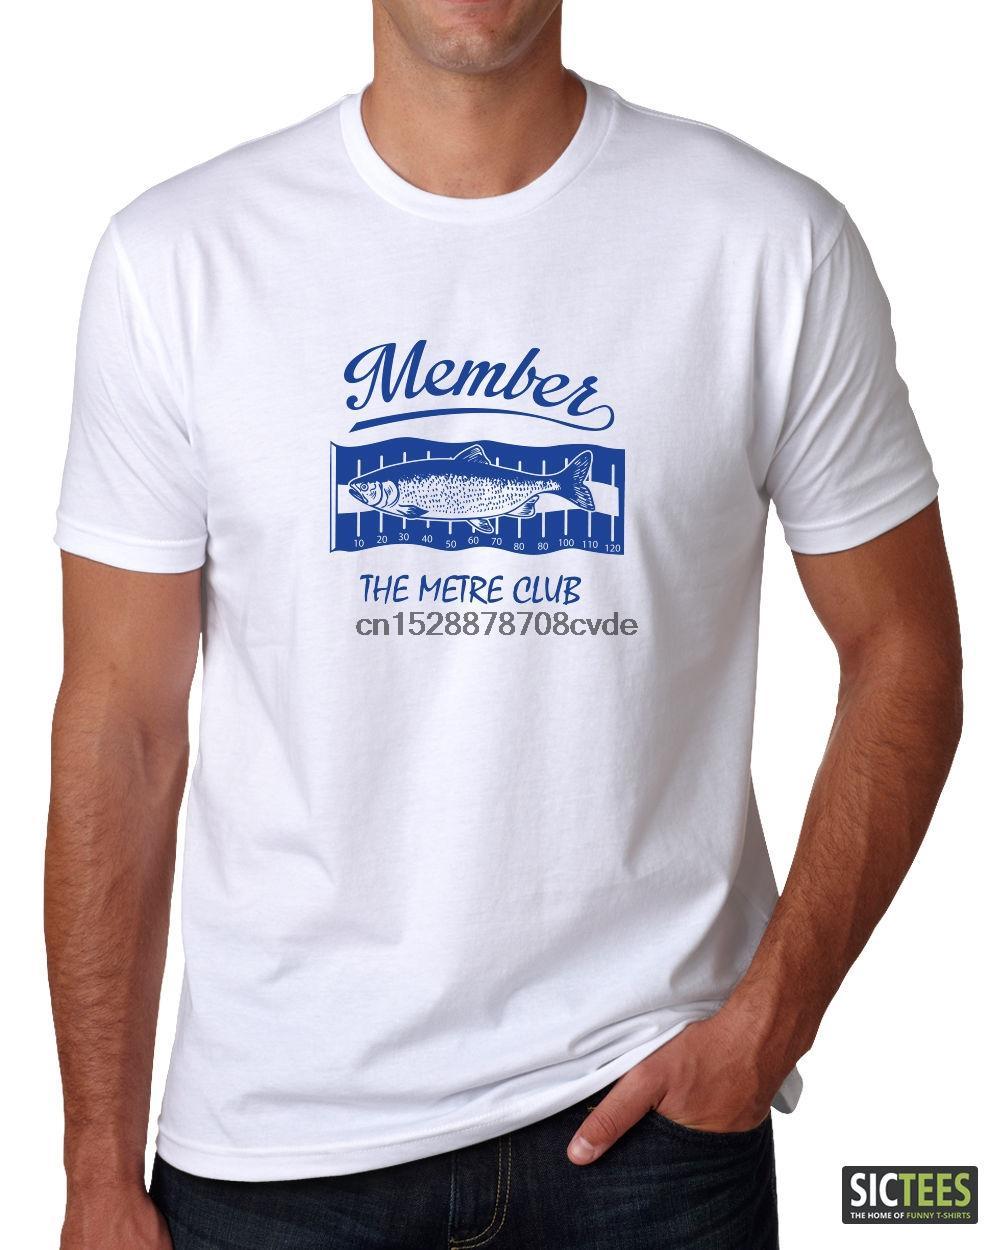 2019 Newest Men Funny New Fishs T-shirt Singlet Member The Metre Club jig heads soft plastics baits Tee Shirt